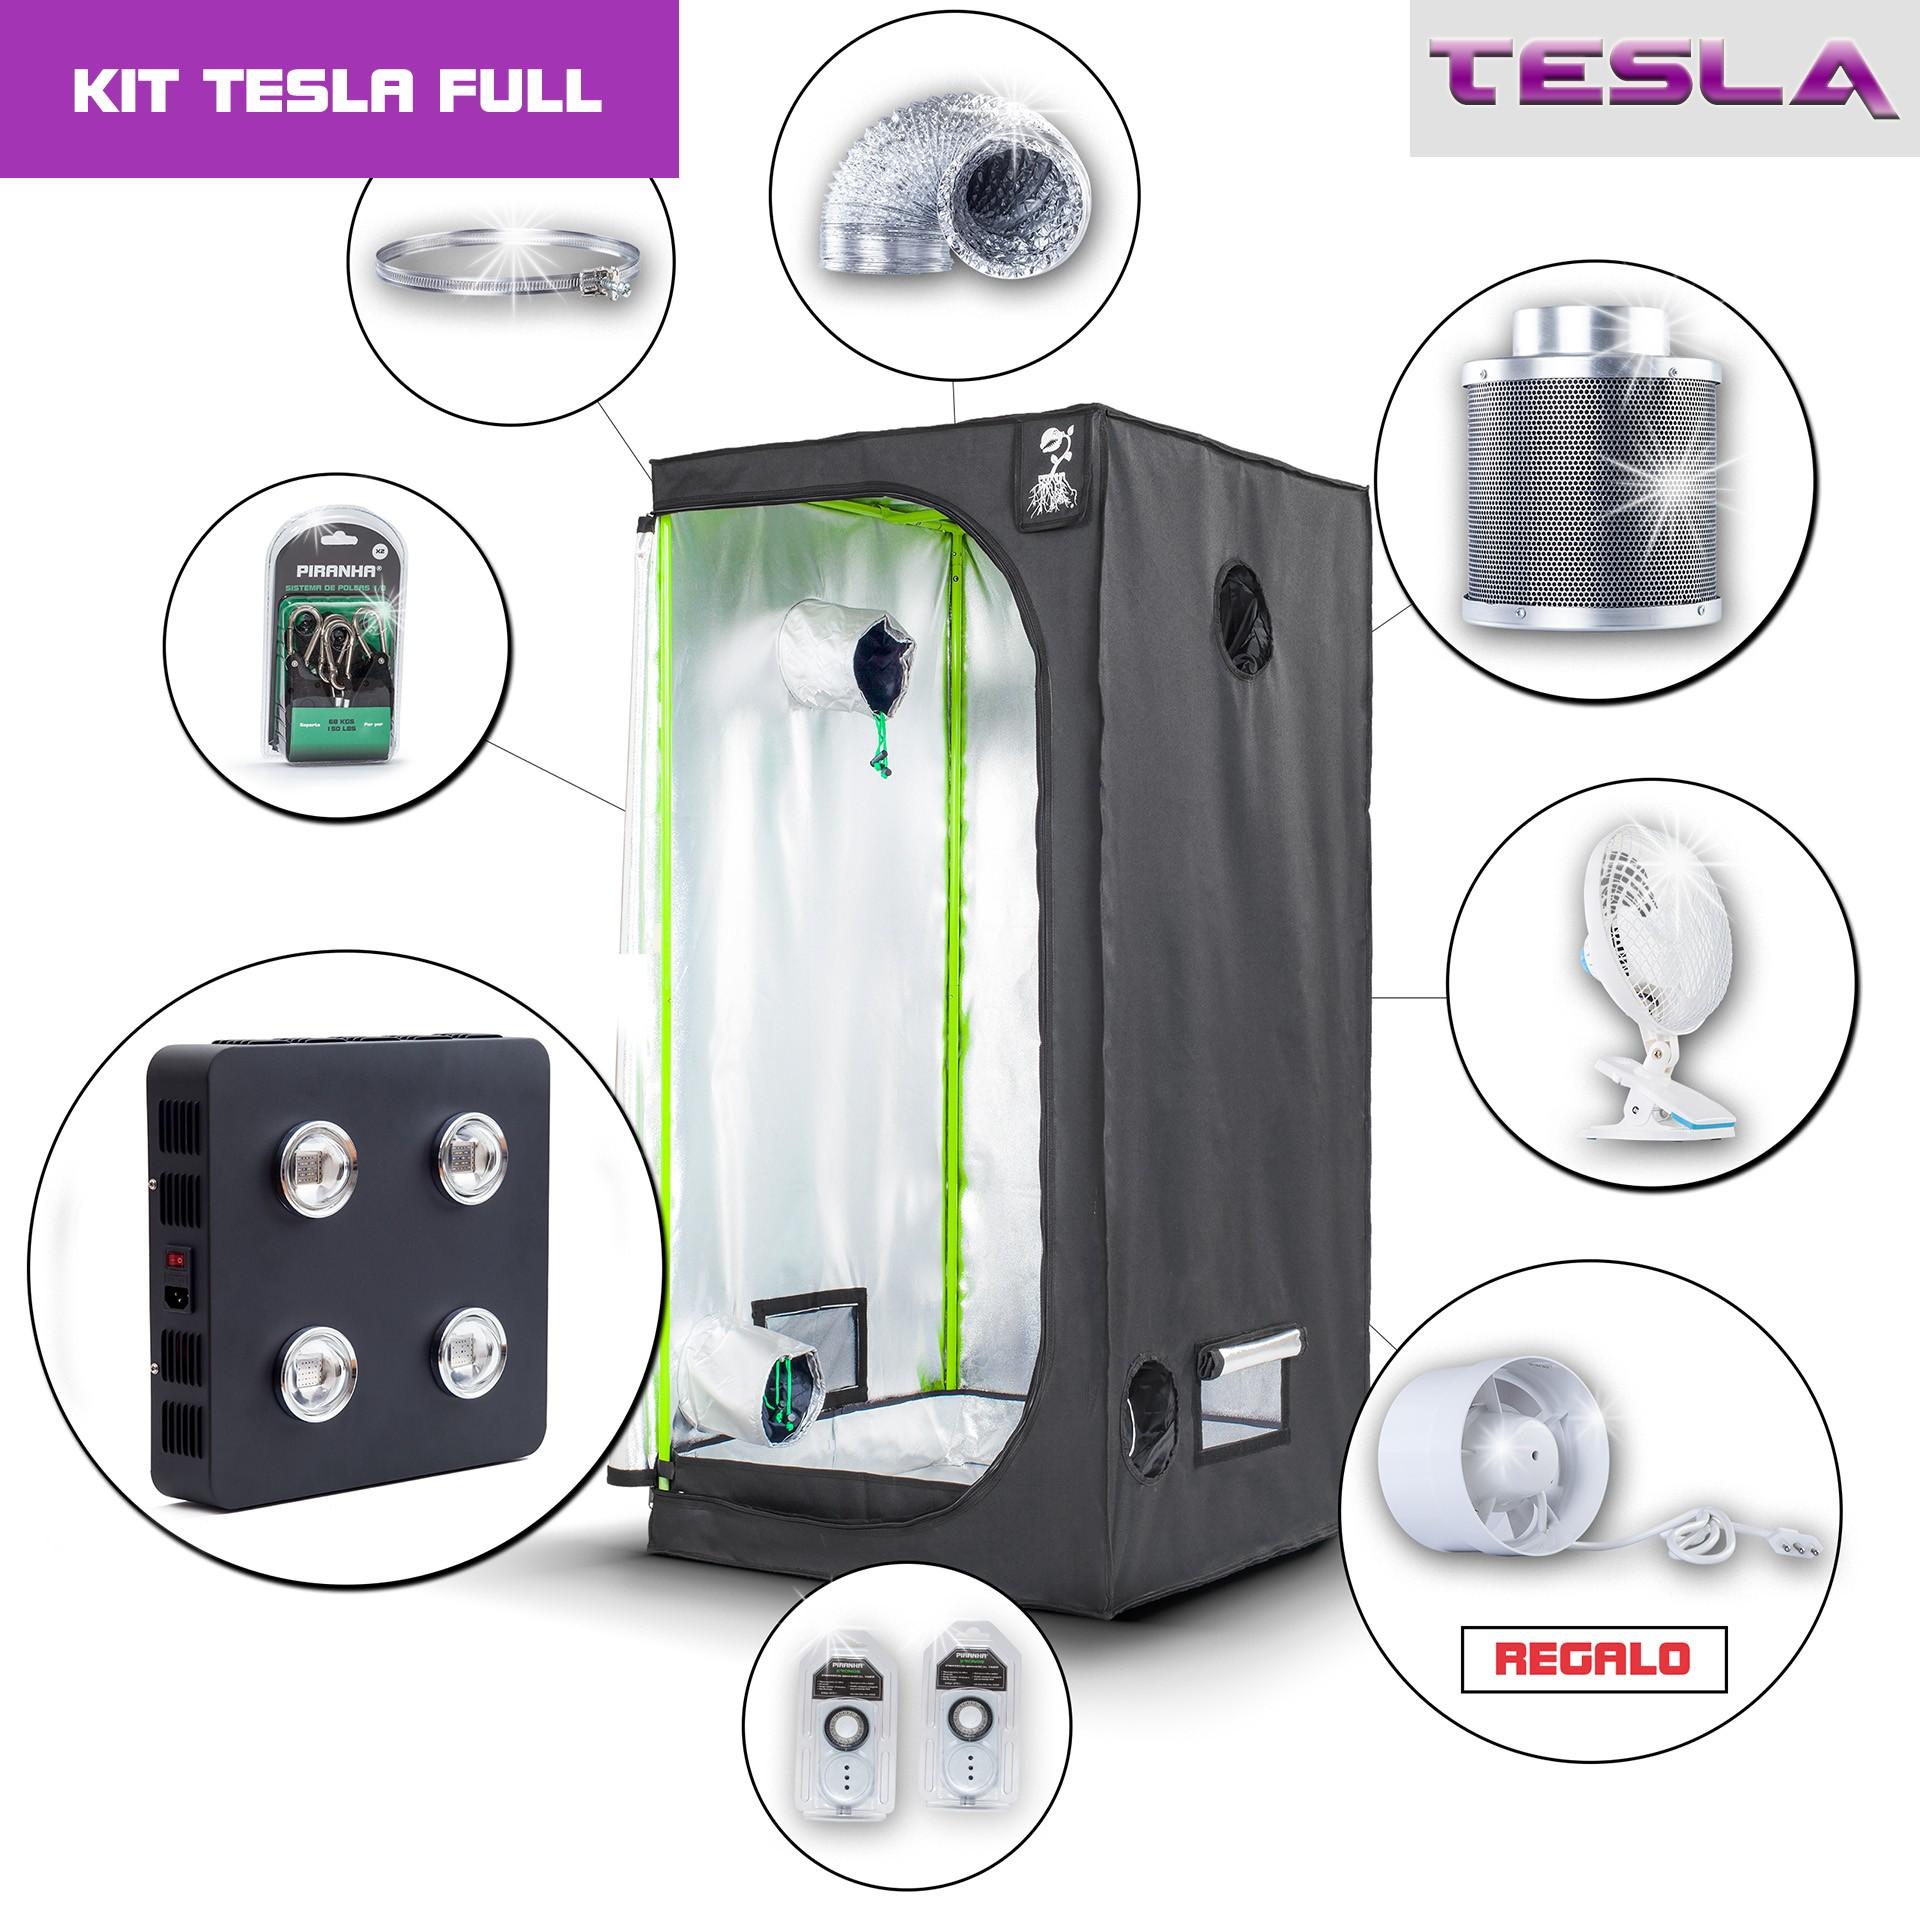 Kit Tesla 80 - T360W Completo